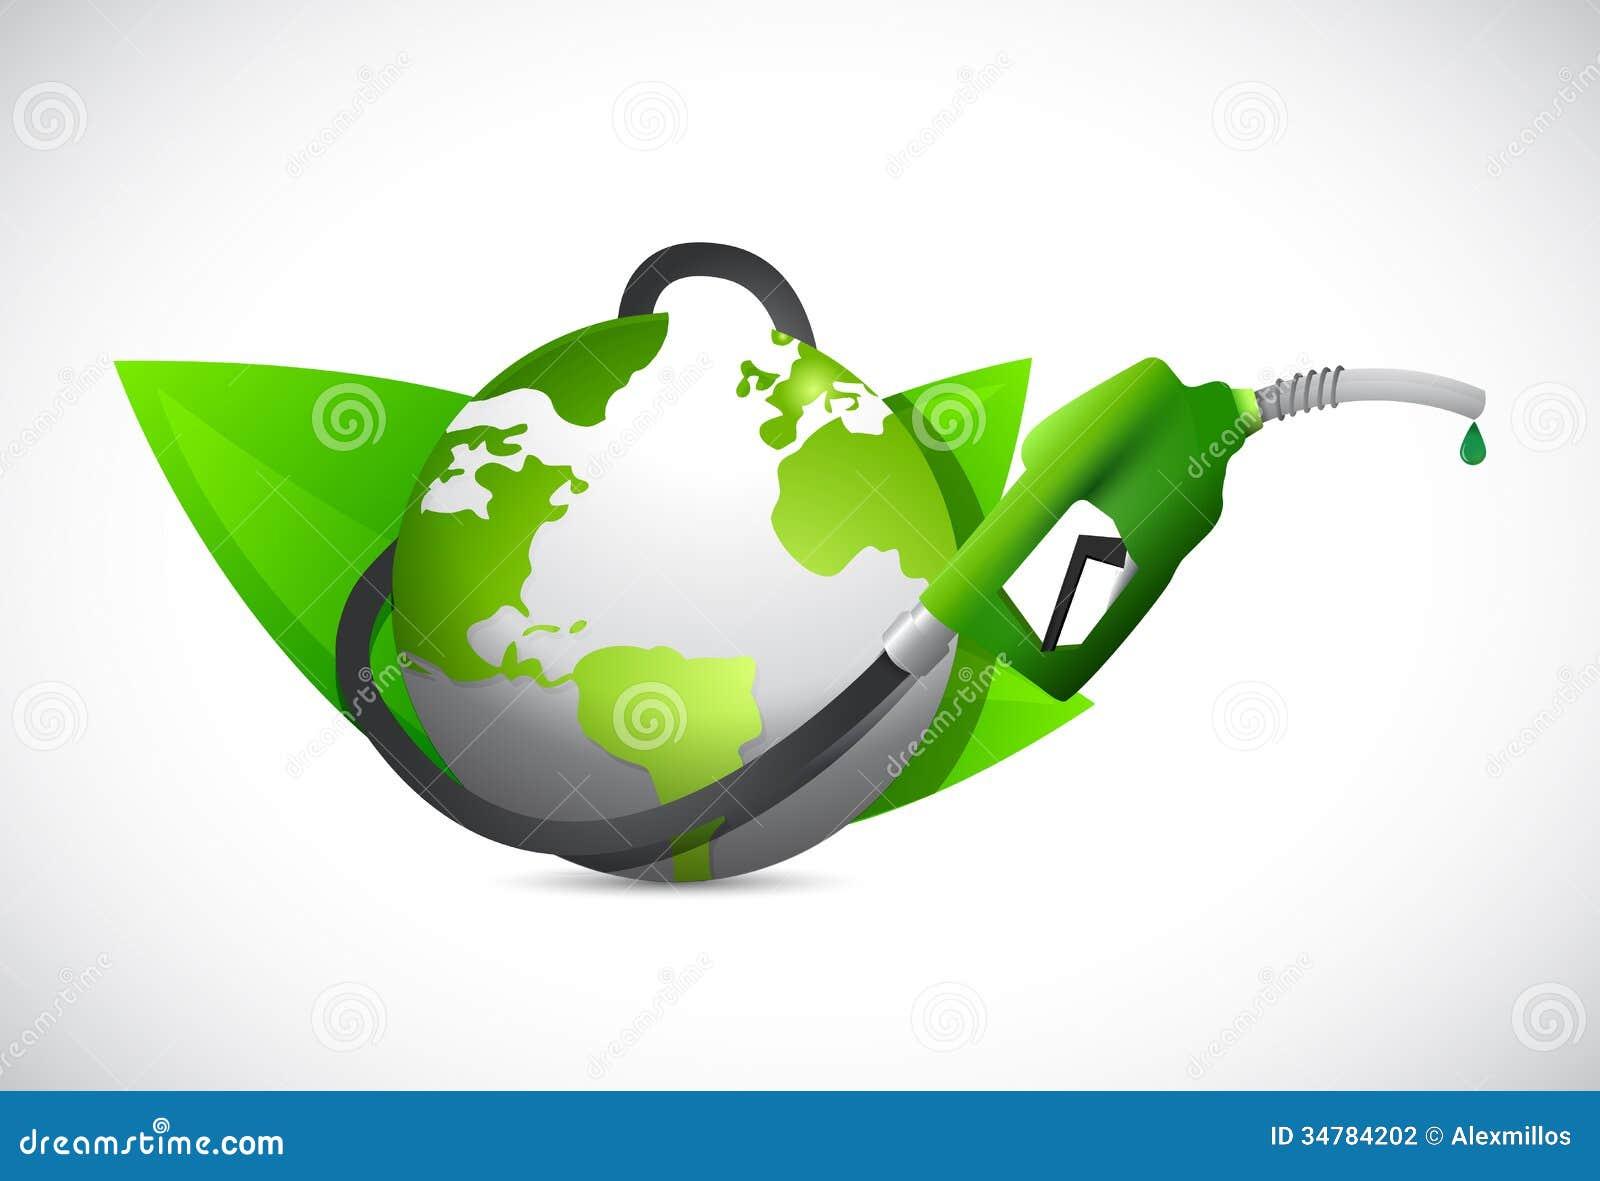 Biodiesel by region